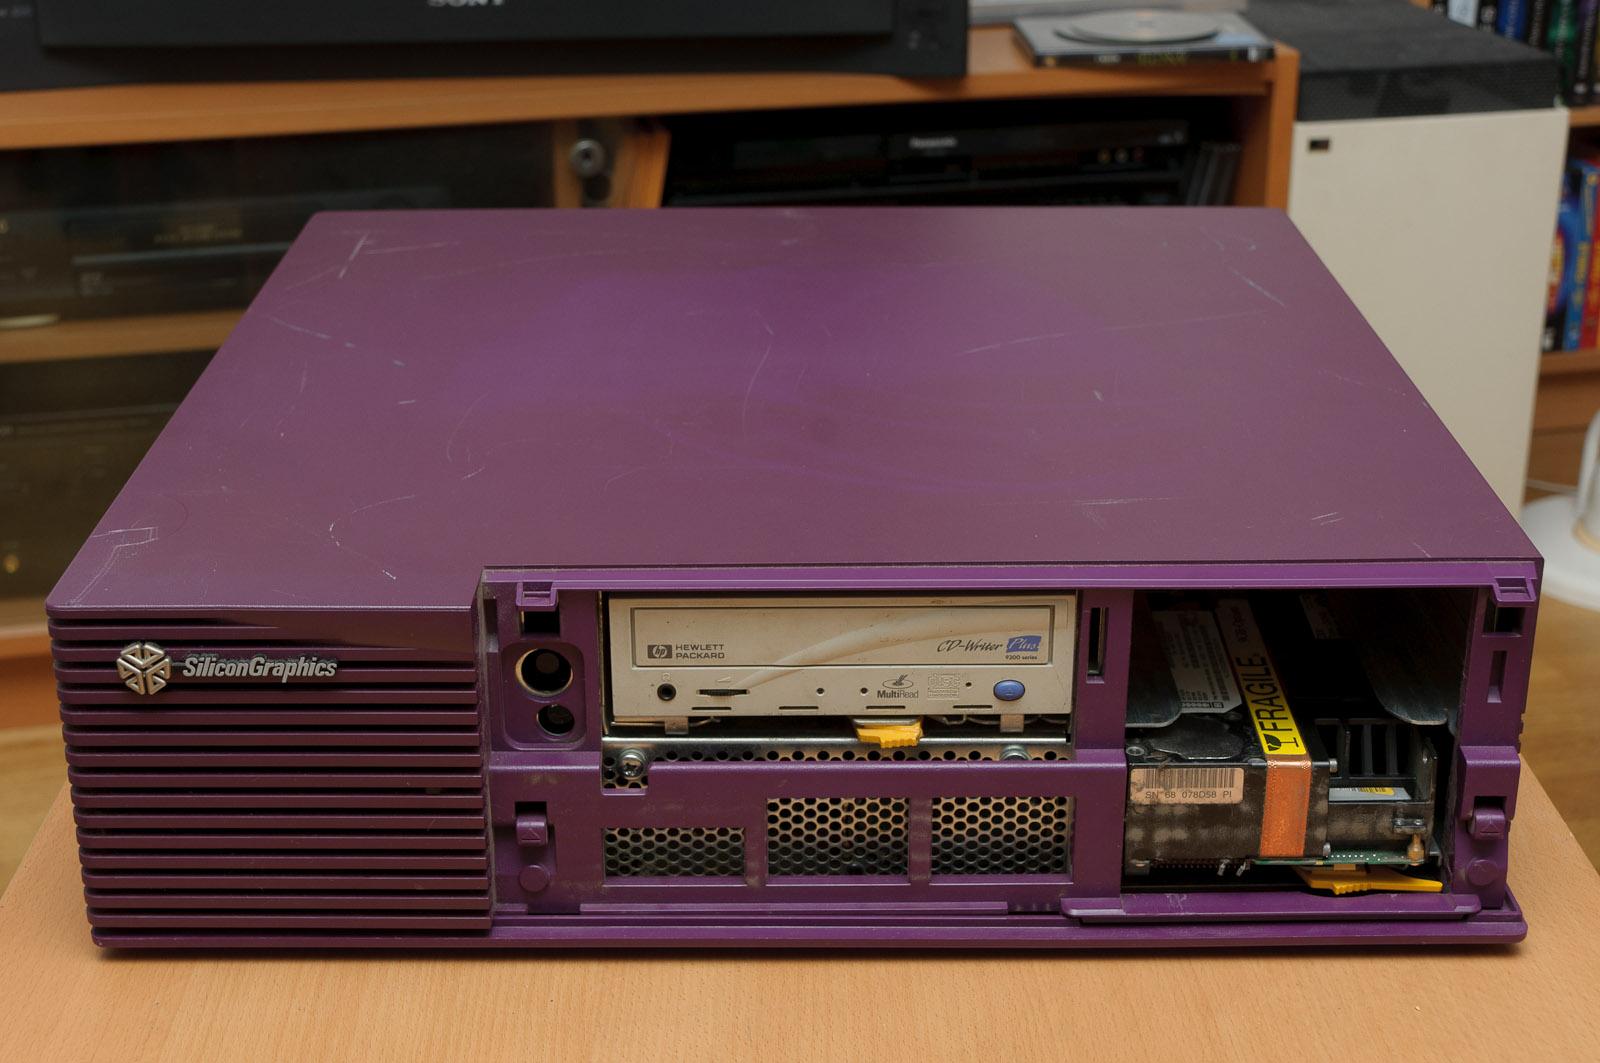 Silicon Graphics CMNB007Y125 SGI Indigo 2 Computer | RecycledGoods.com